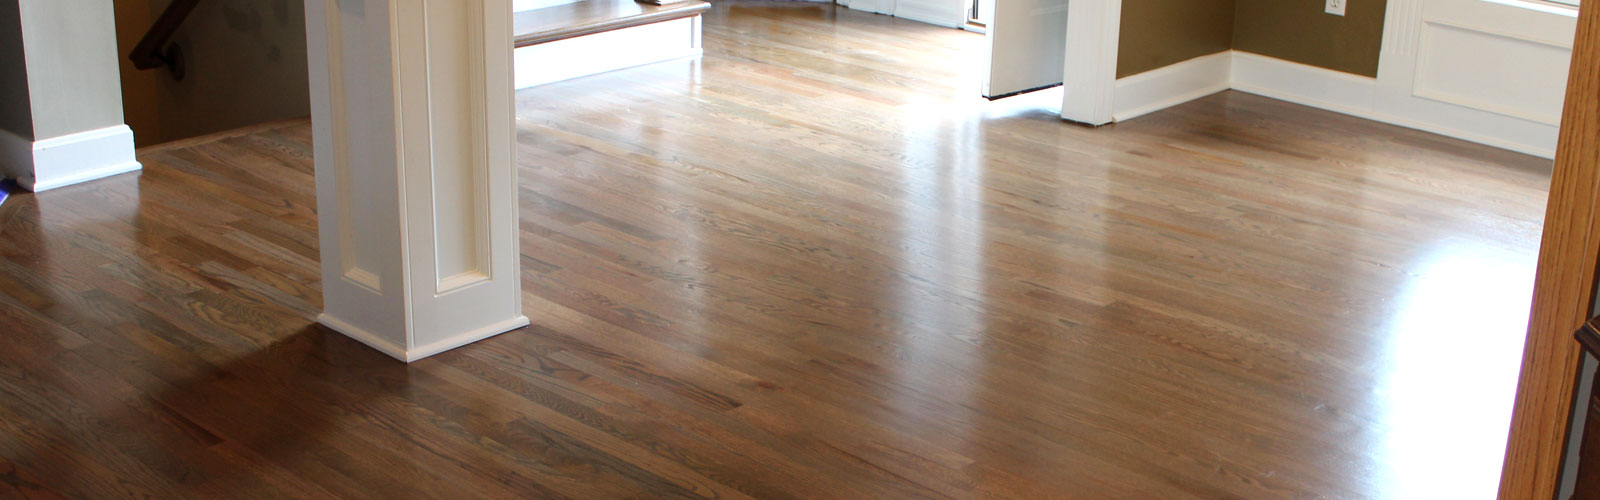 hardwood floor refinishing project kansas city